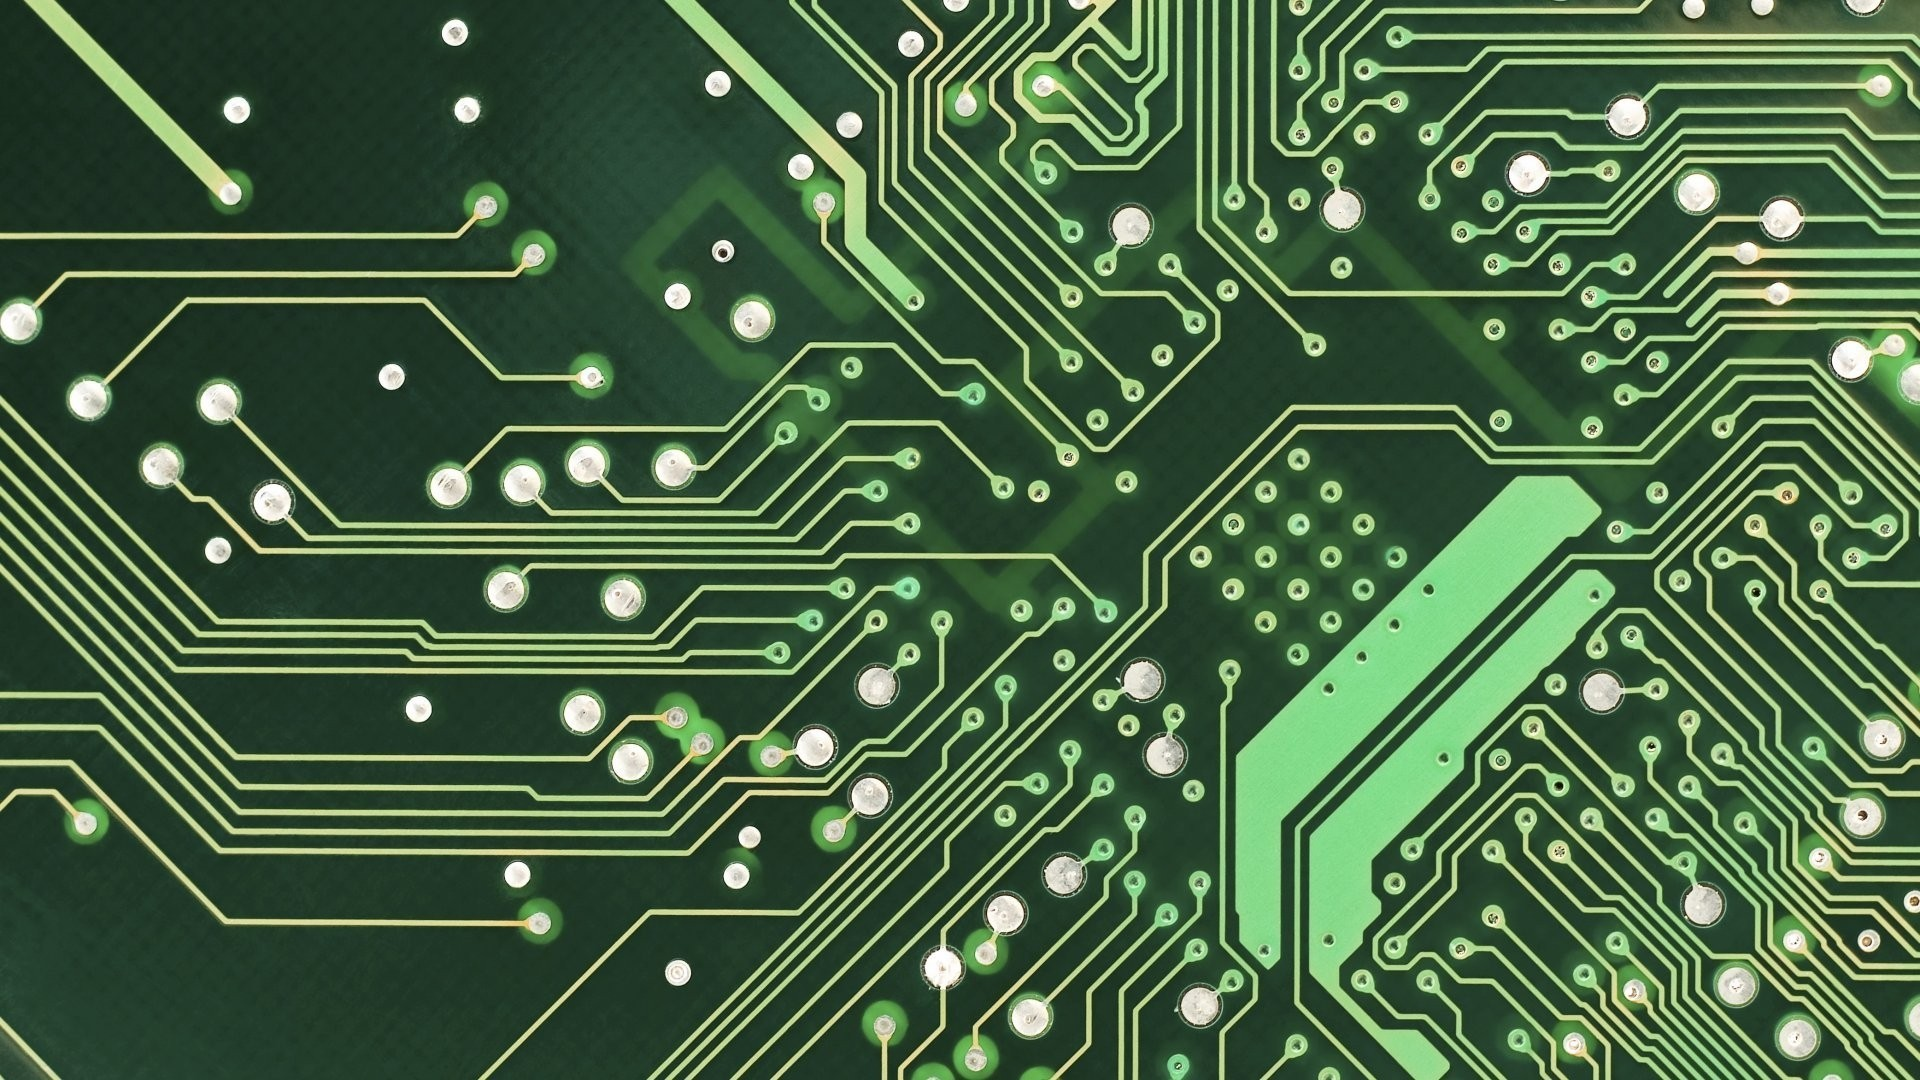 Circuit Board Background Wallpaper